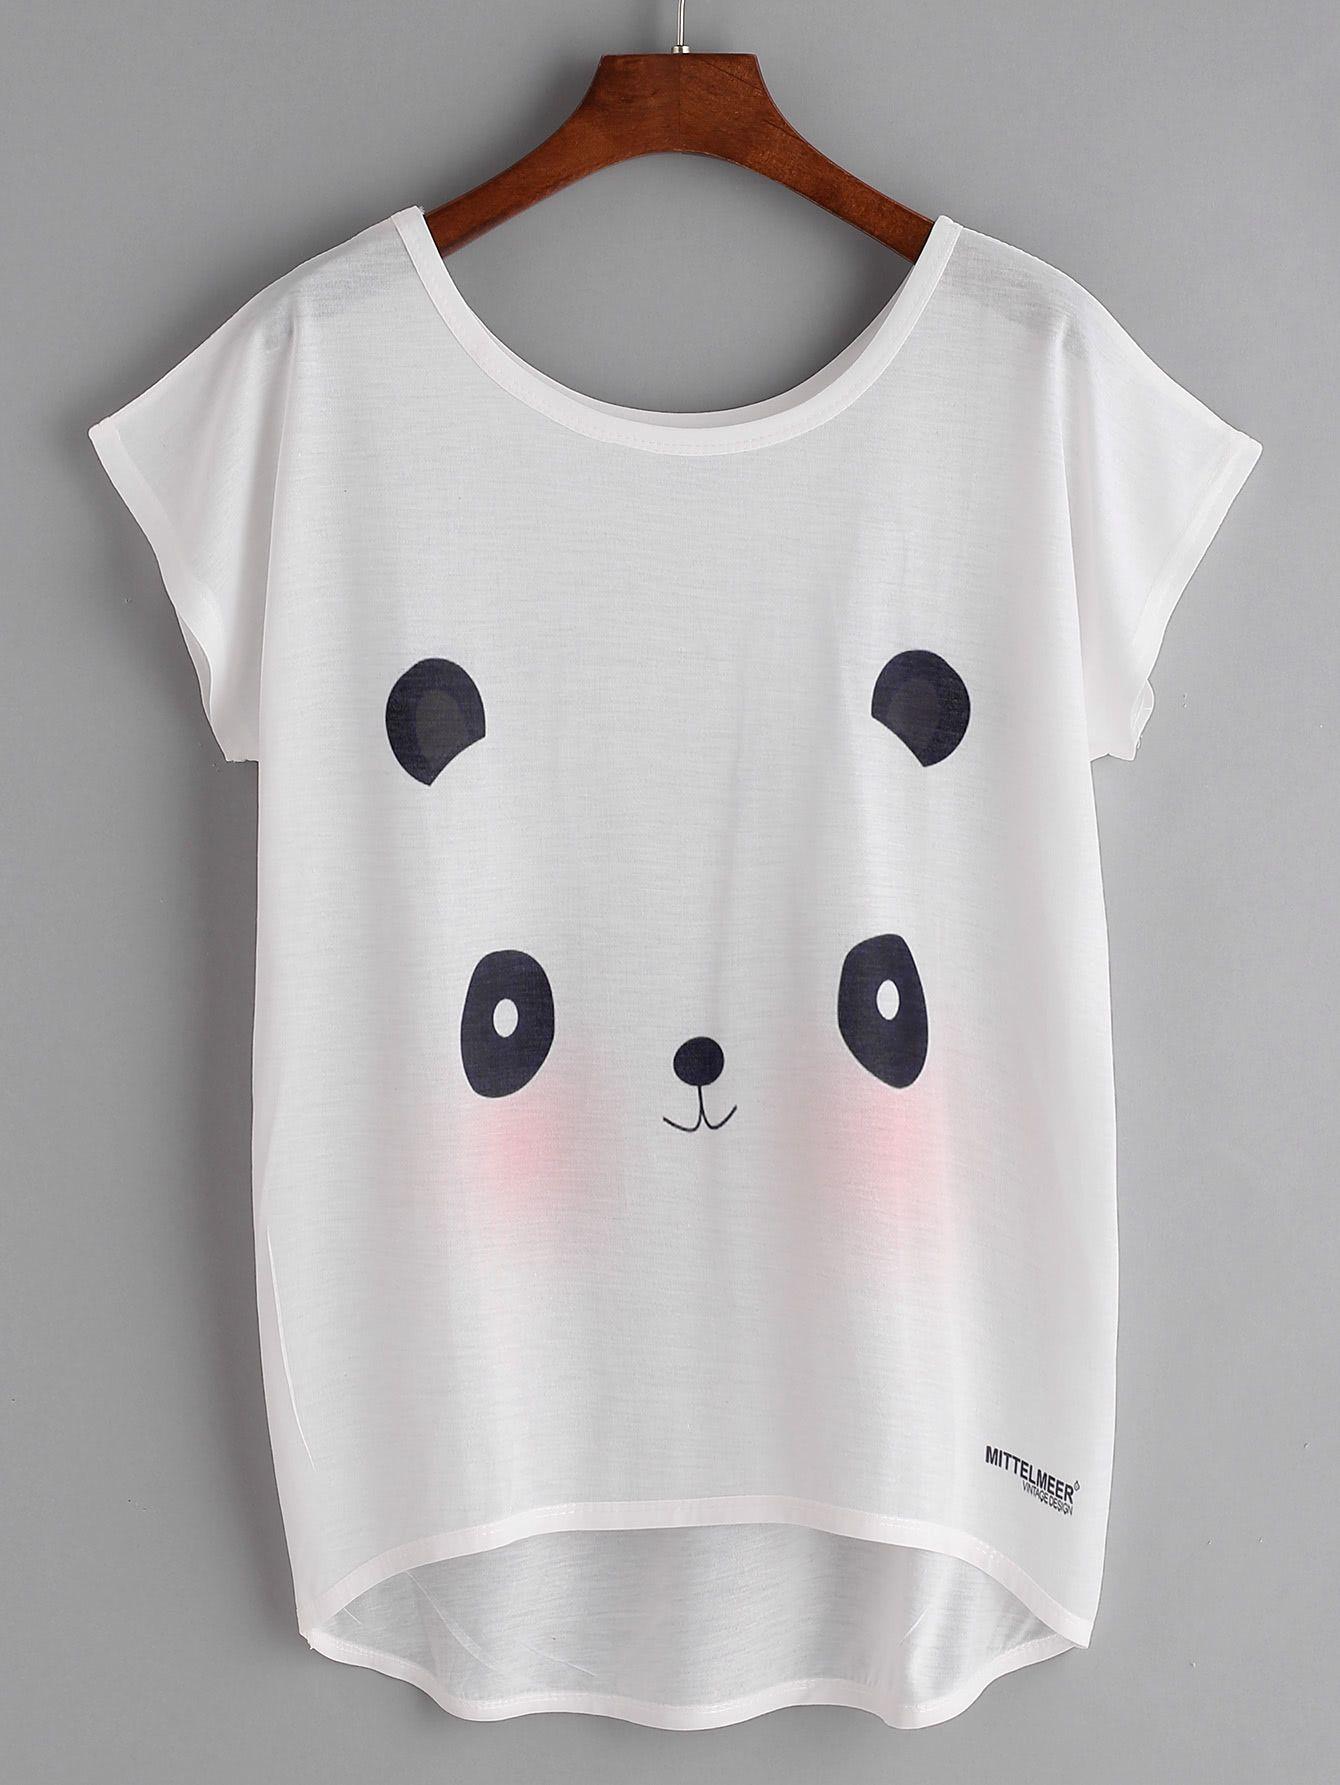 57c2ef900 Shop Panda Print Batwing Sleeve Dip Hem Tee online. SheIn offers Panda Print  Batwing Sleeve Dip Hem Tee & more to fit your fashionable needs.